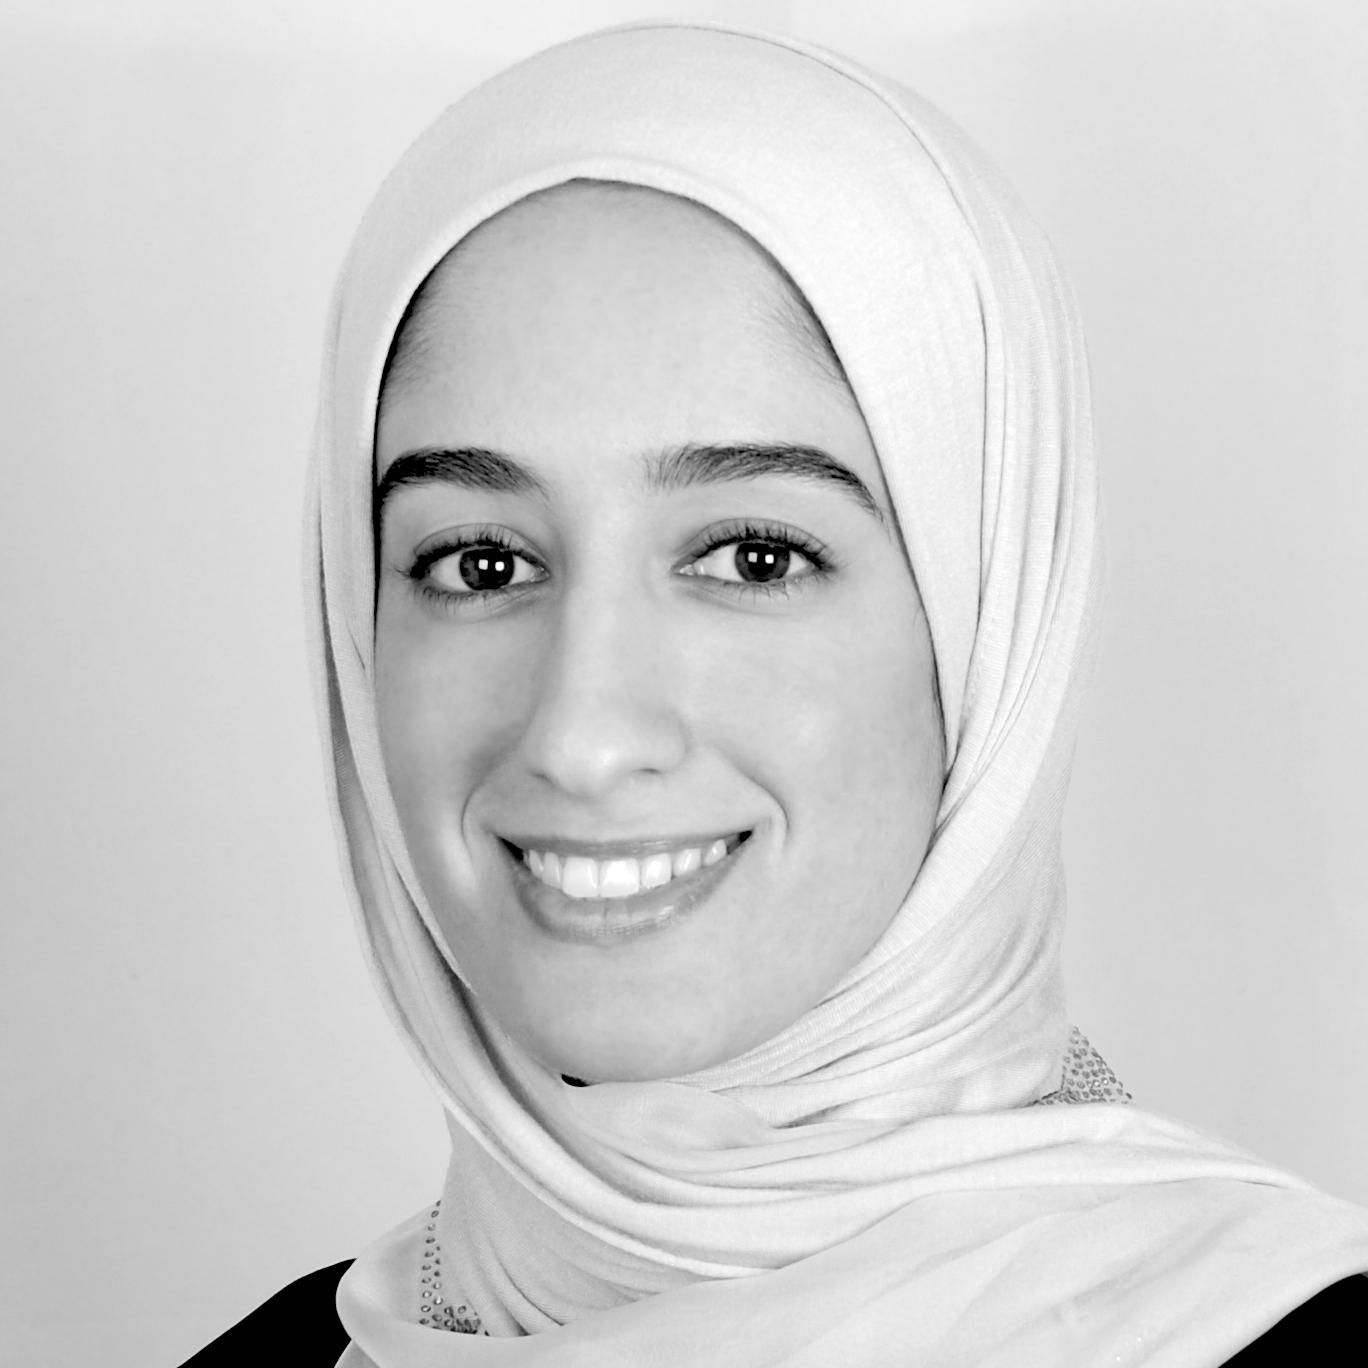 المشهد: تأويلات   The Spectacle: Inter[pretation]   مريم النعيمي |    Mariam Alnoaimi